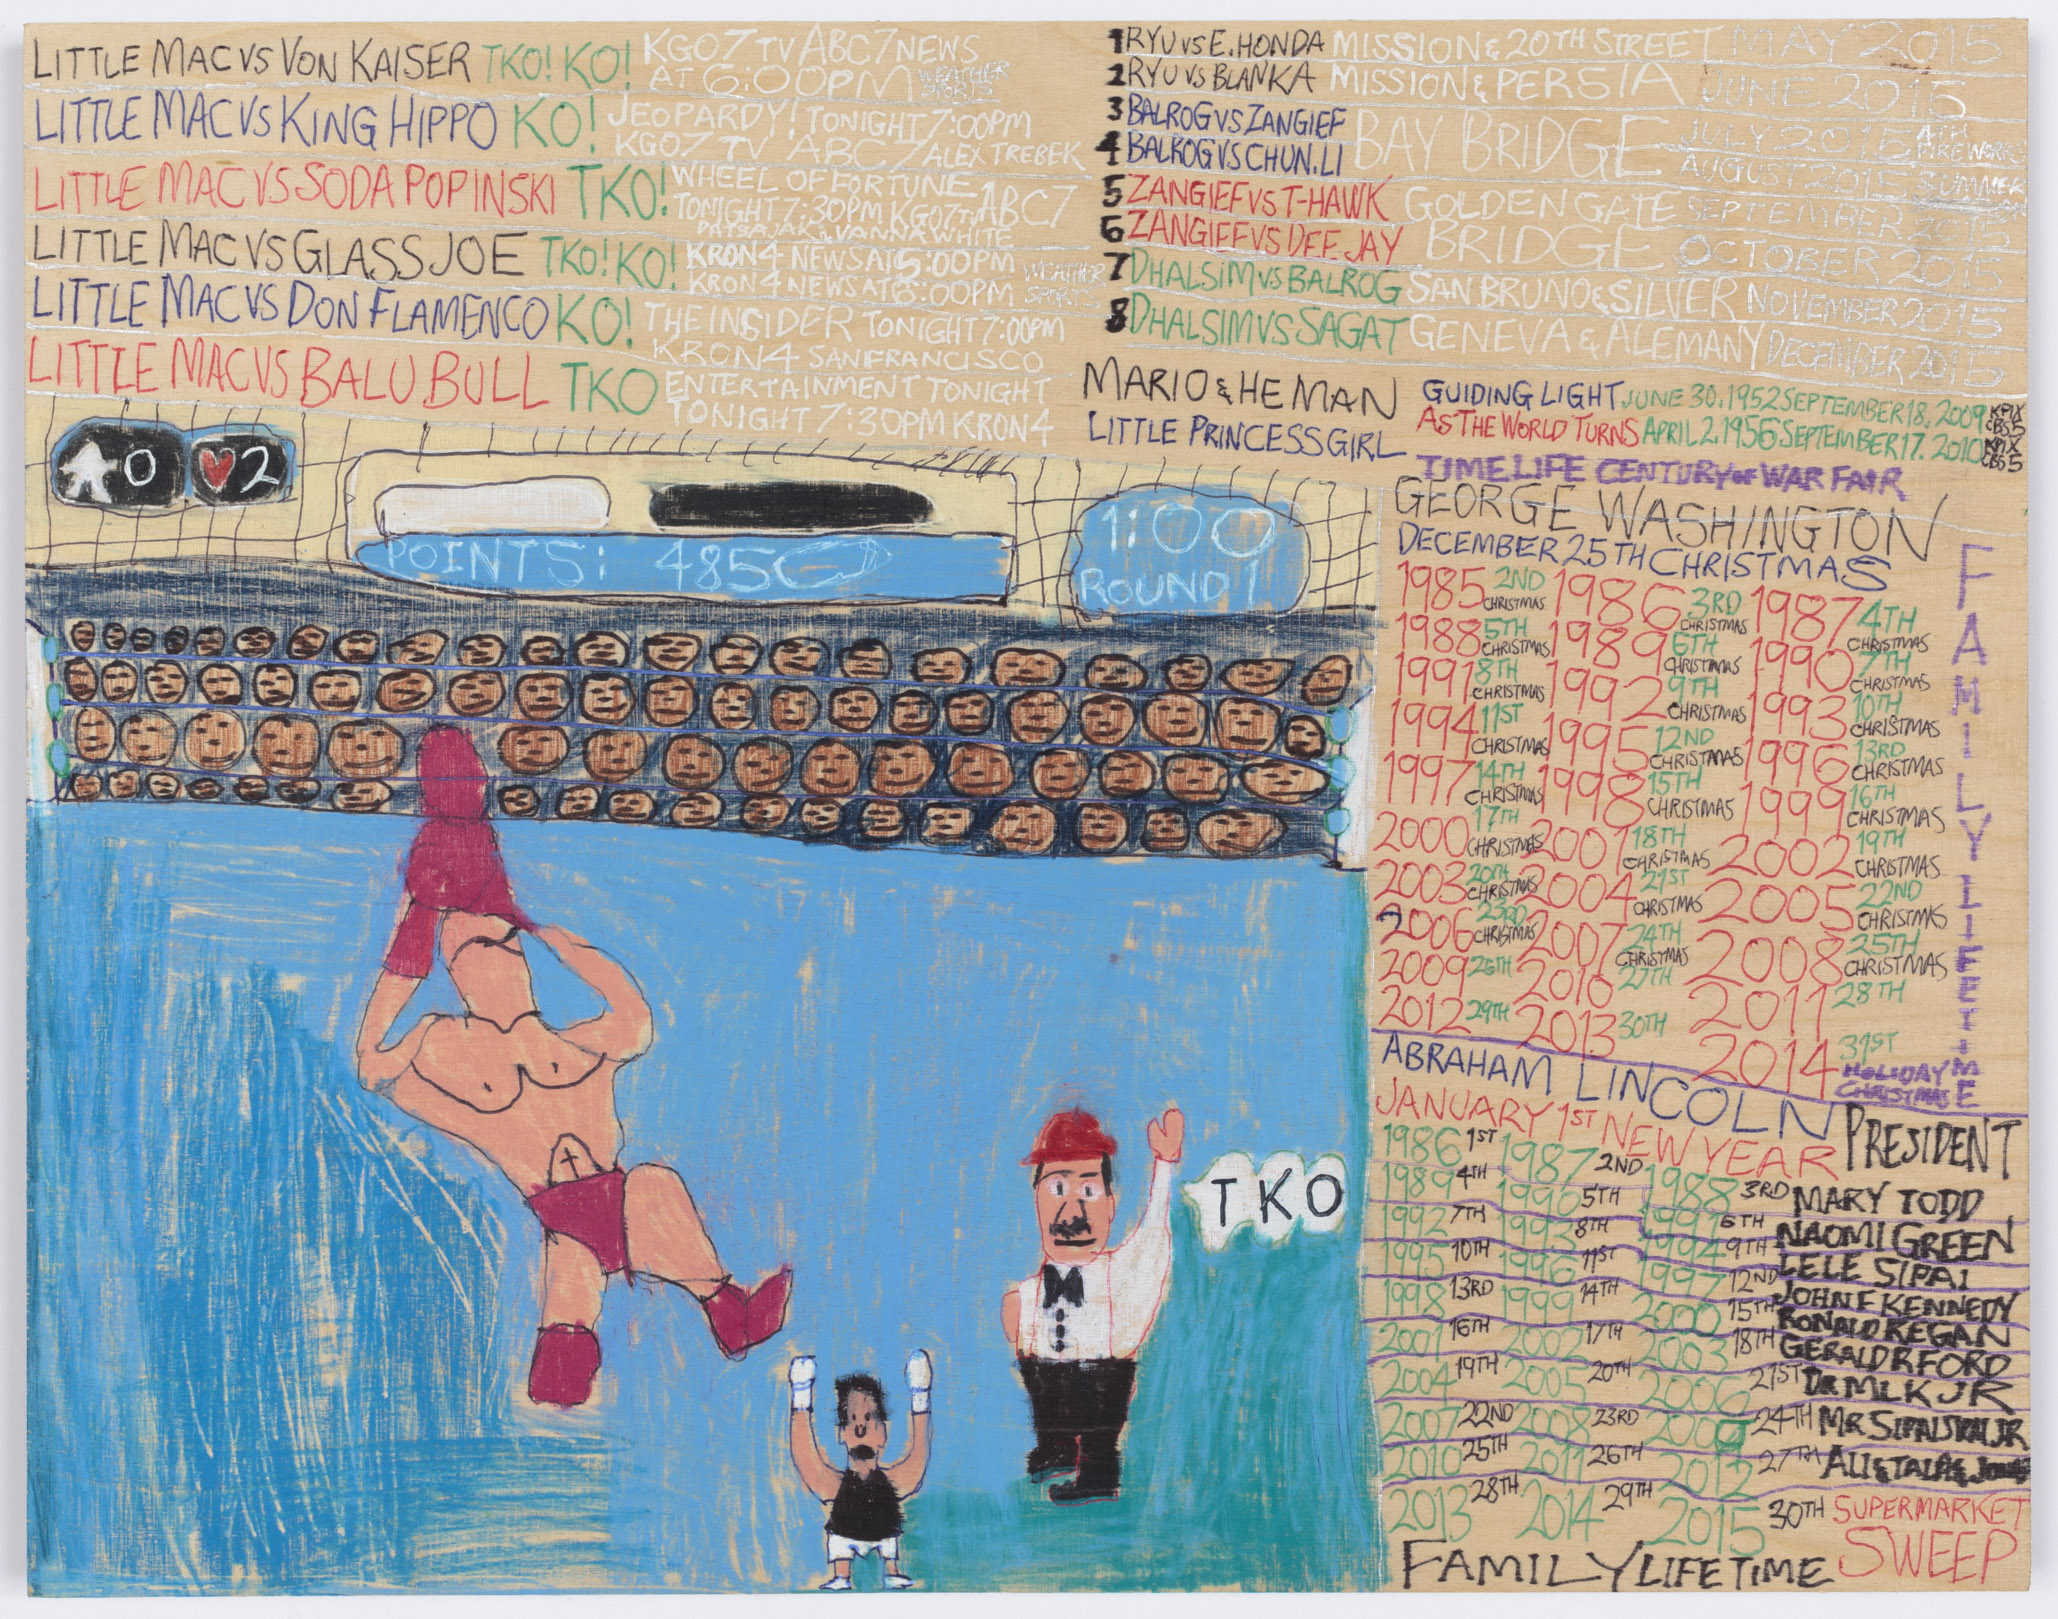 Daniel Green,  Little Mac vs Soda Poponski , 2015, mixed media on wood, 11.5 x 15 inches